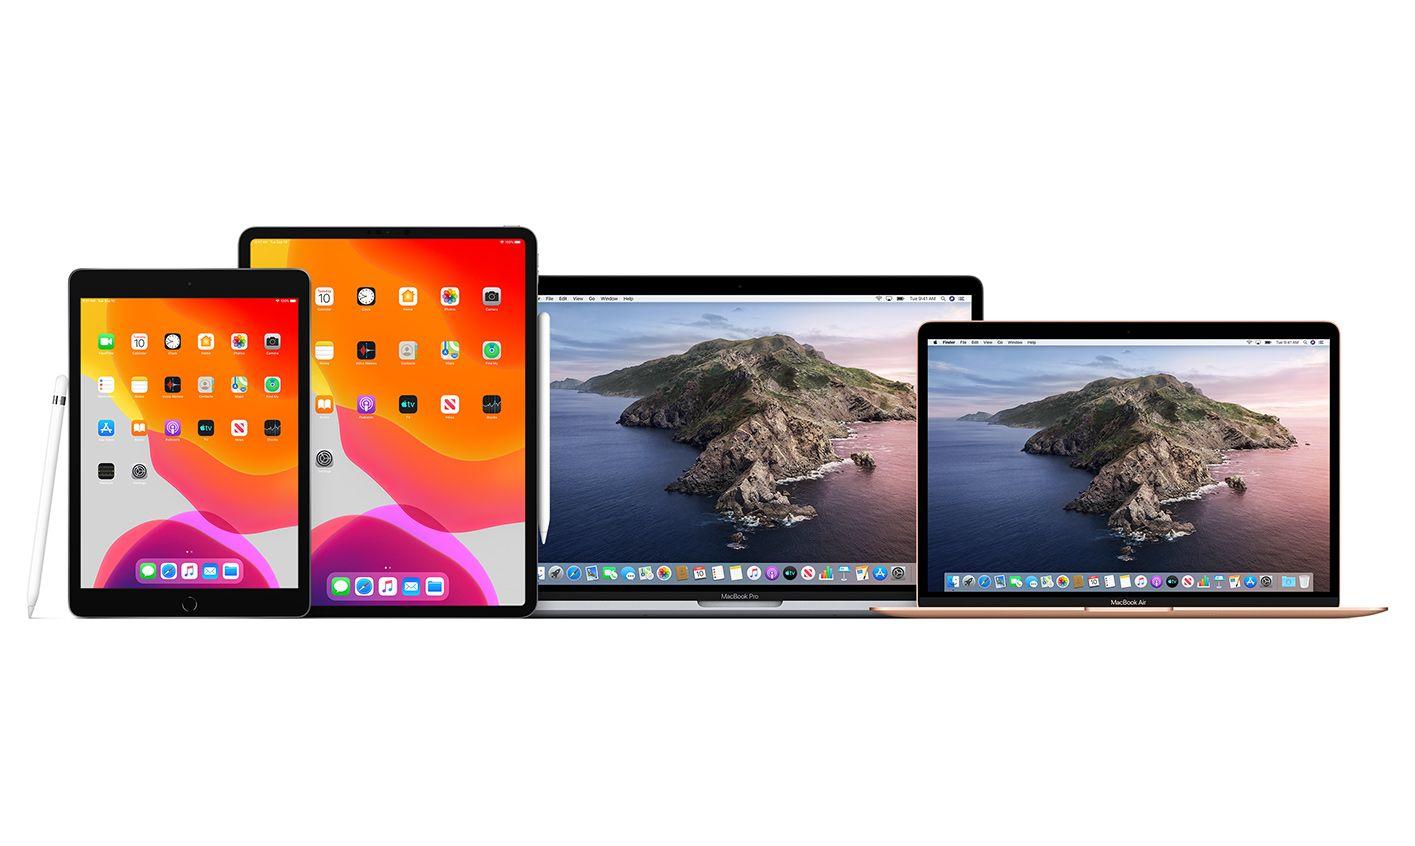 Macbook Pros & iMac